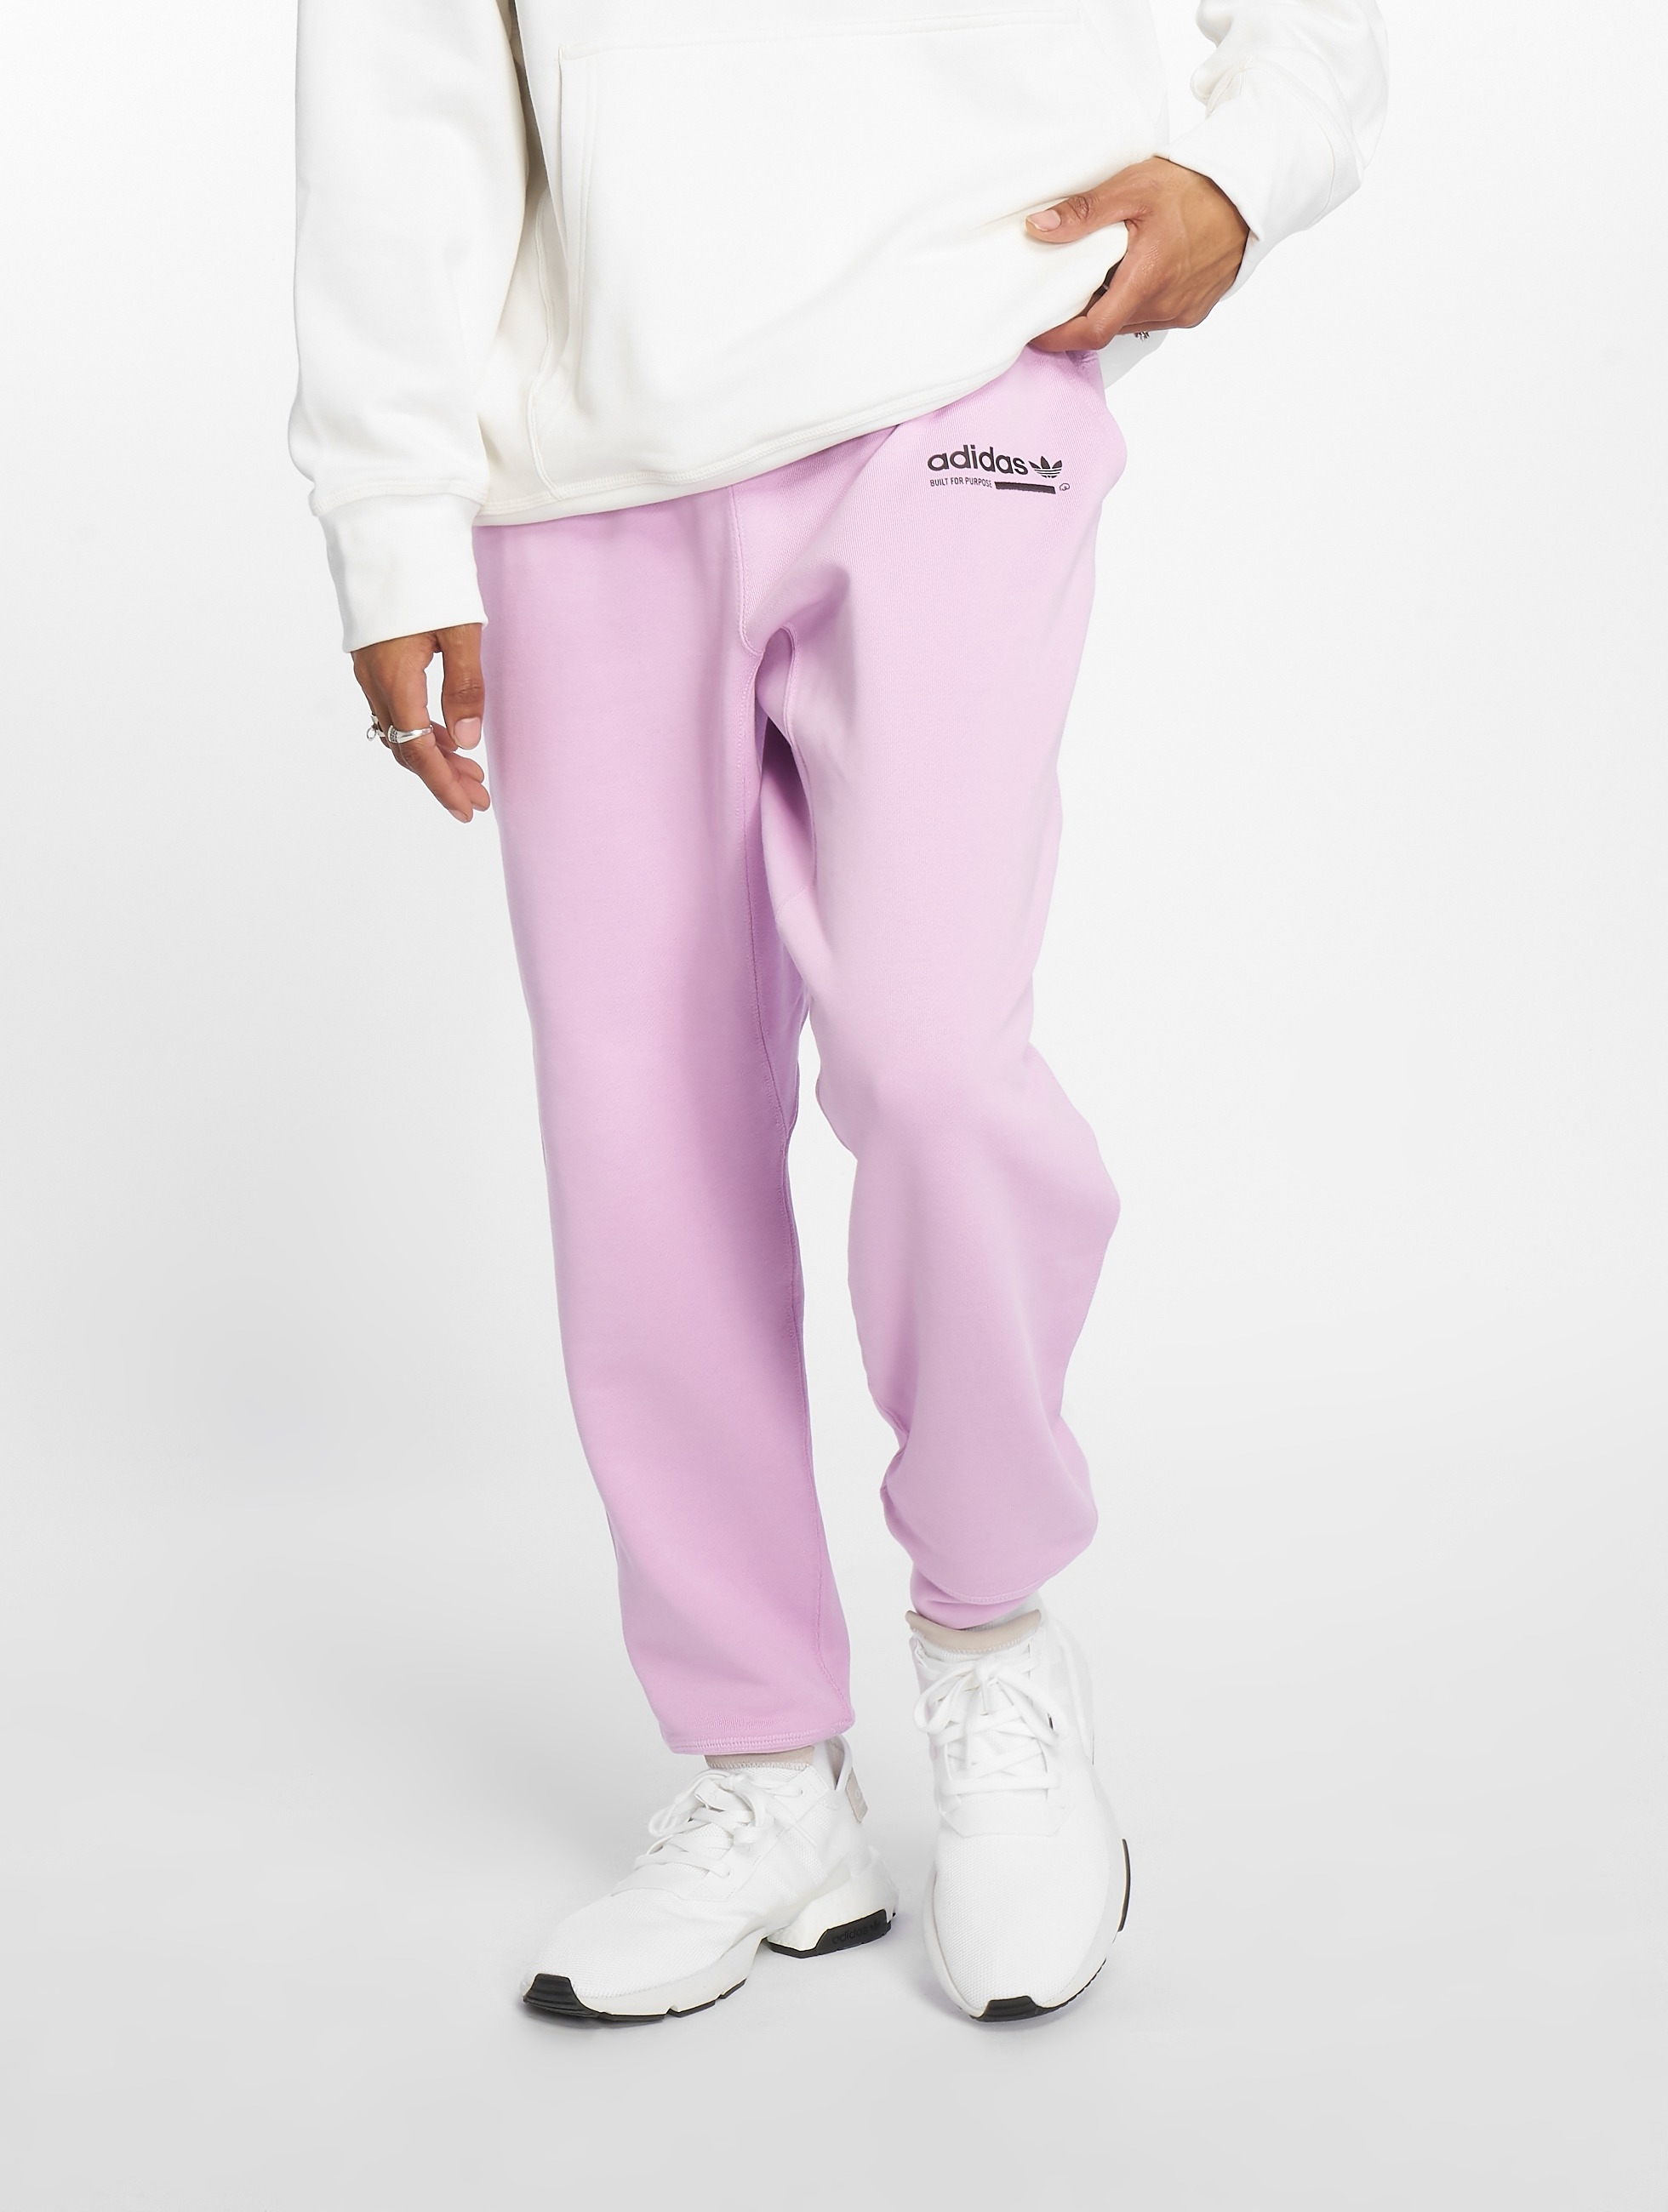 653e4f30eabc8 adidas-originals-Homme-Pantalons-amp-Shorts-Jogging-Kaval miniature